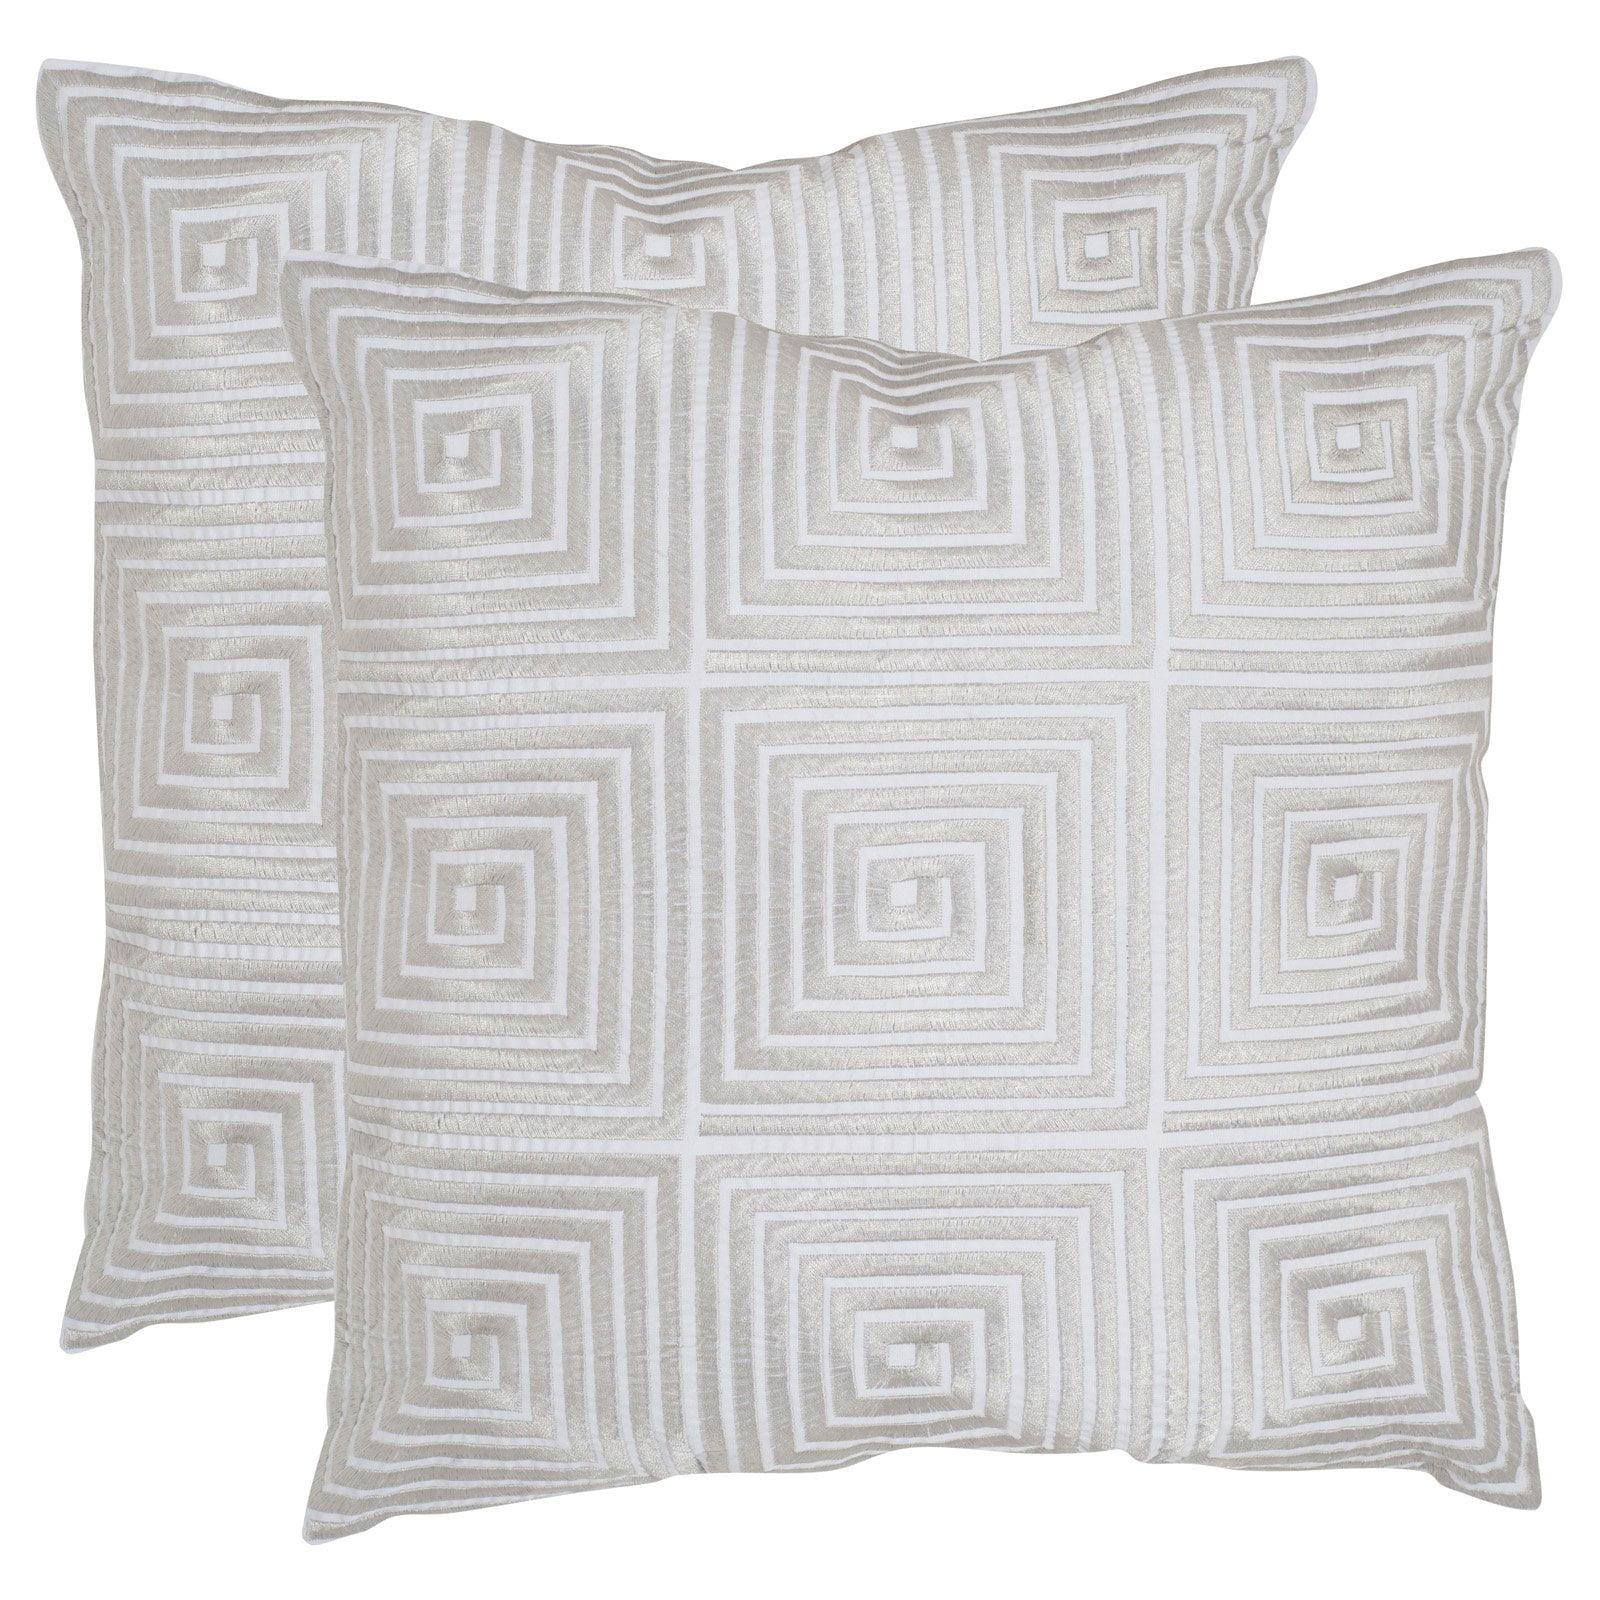 Safavieh Lacie Decorative Pillow - Set of 2